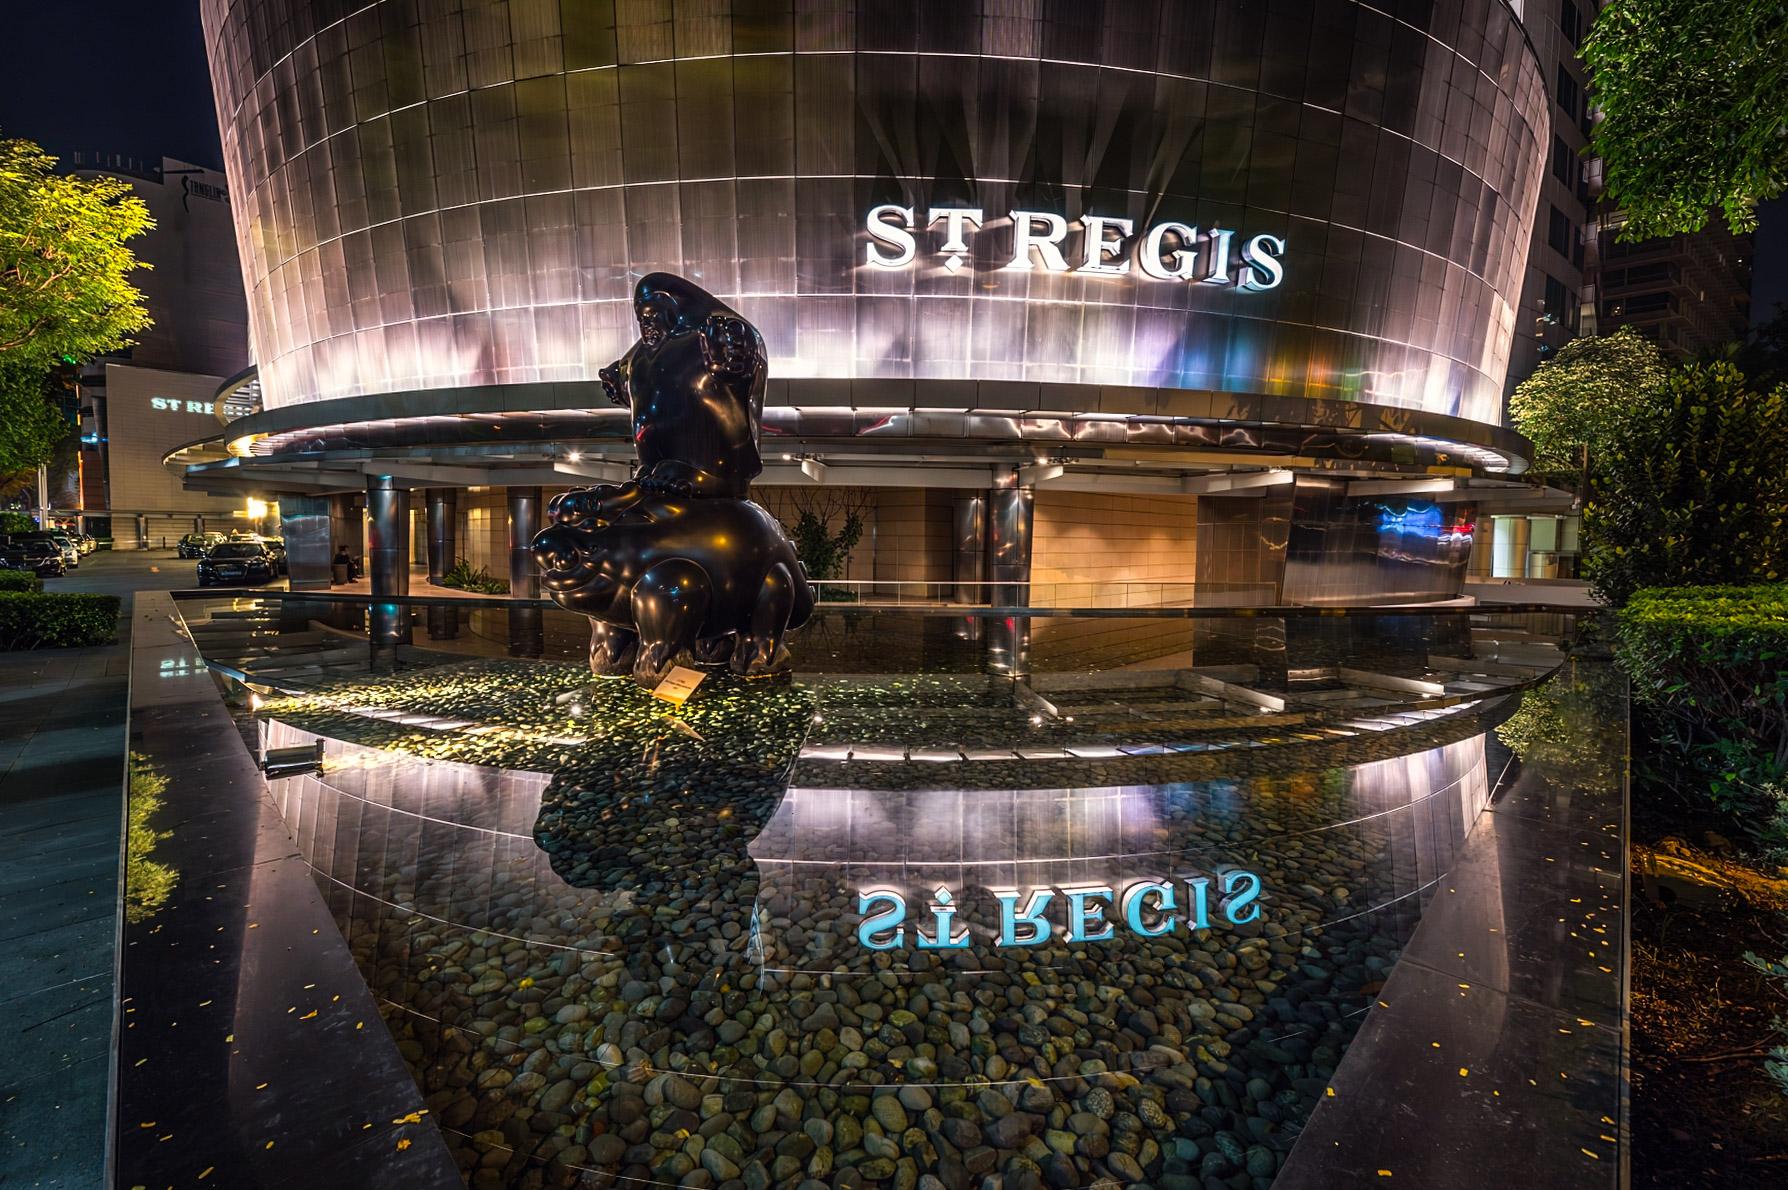 The St. Regis Singapore Luxury Hotel - Singapore